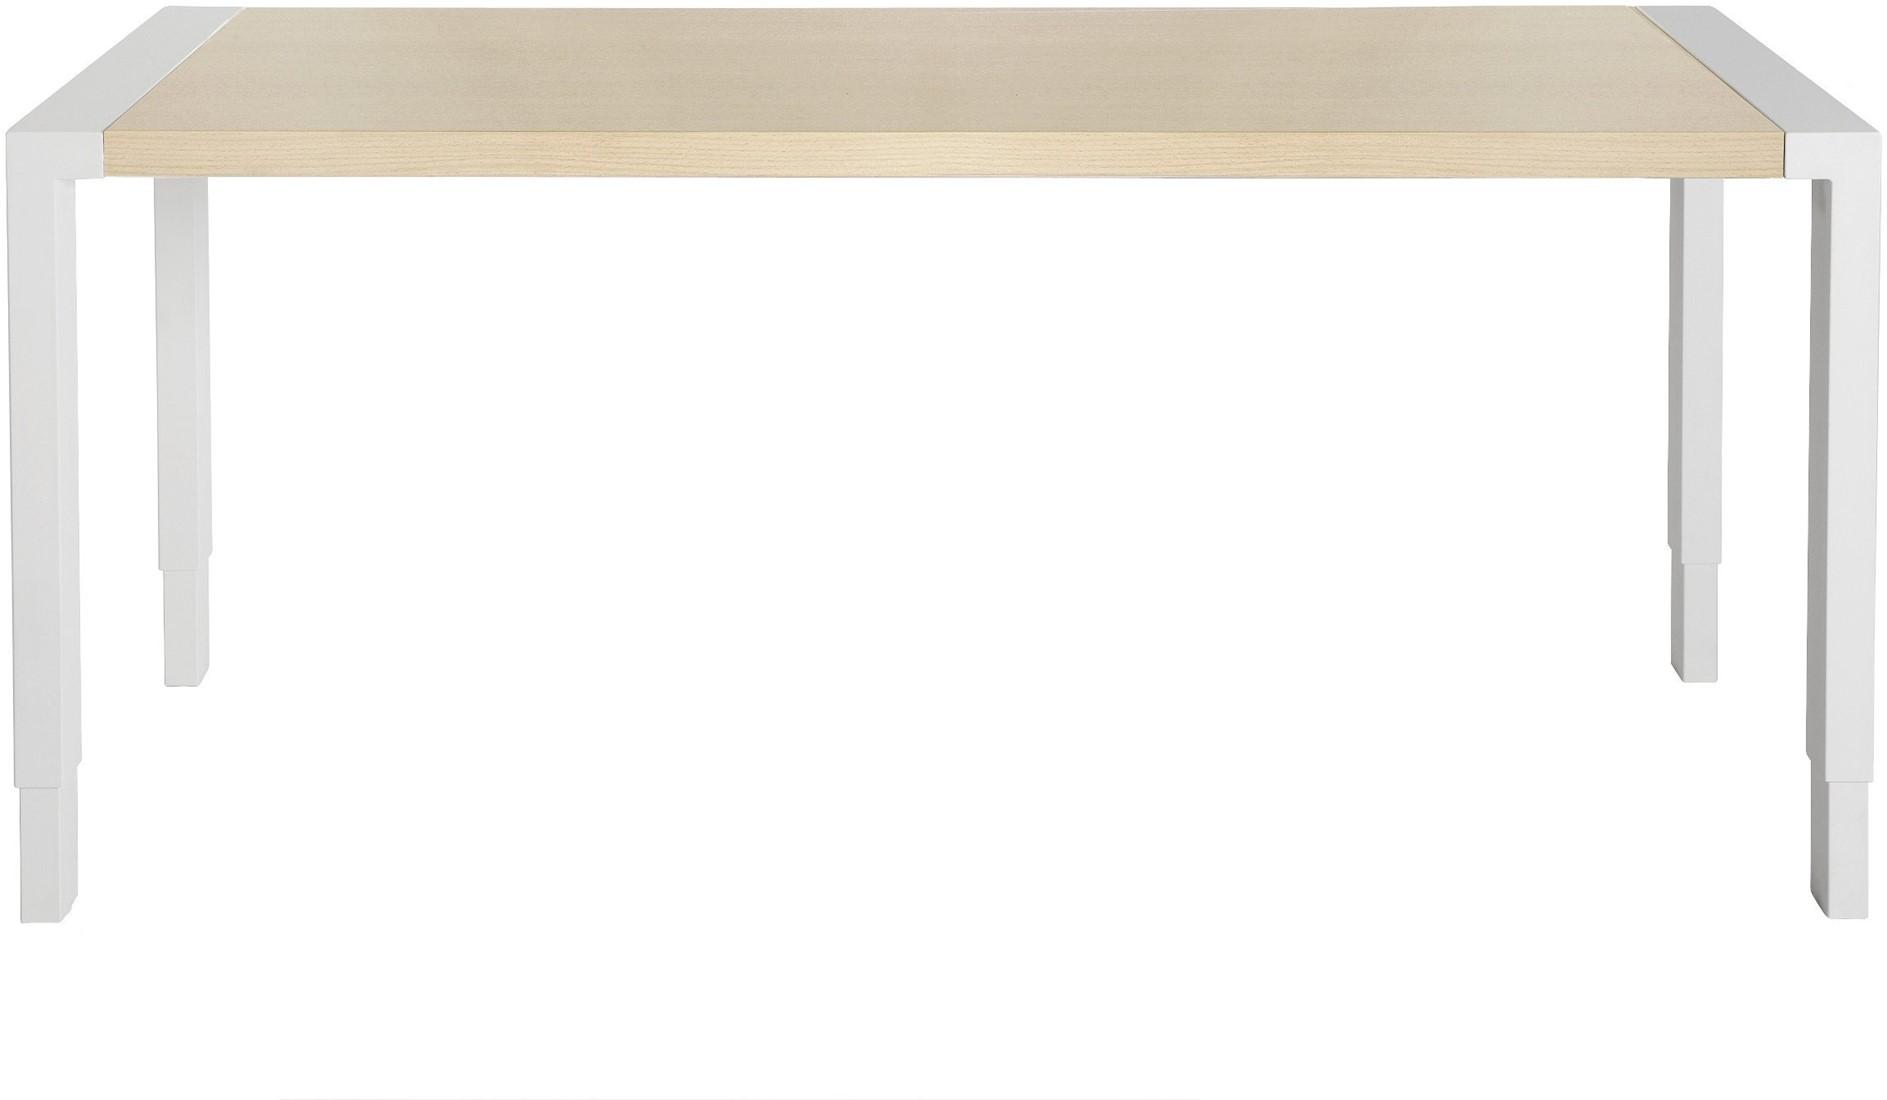 vepa edge bureau bladdiepte 90cm verstelbaar 62 86cm slinger 200 x 90 ww wit bij bruinsma. Black Bedroom Furniture Sets. Home Design Ideas